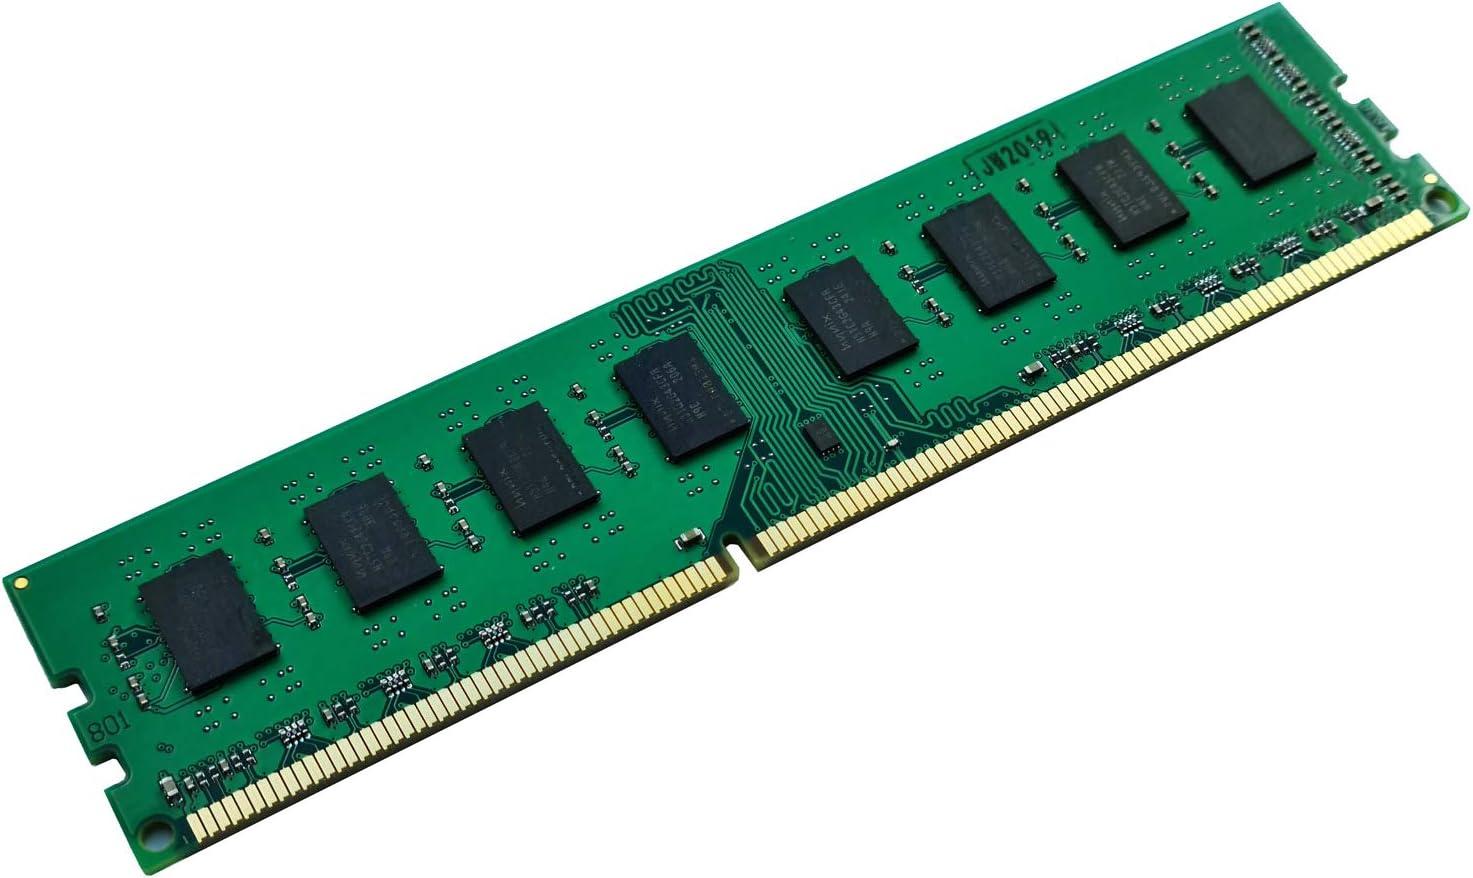 dekoelektropunktde 2GB PC RAM Memoria DDR3, componente Alternativo, Apto para Microstar (MSI) 970A Gaming Pro Carbon   Memoria Principal DIMM PC3